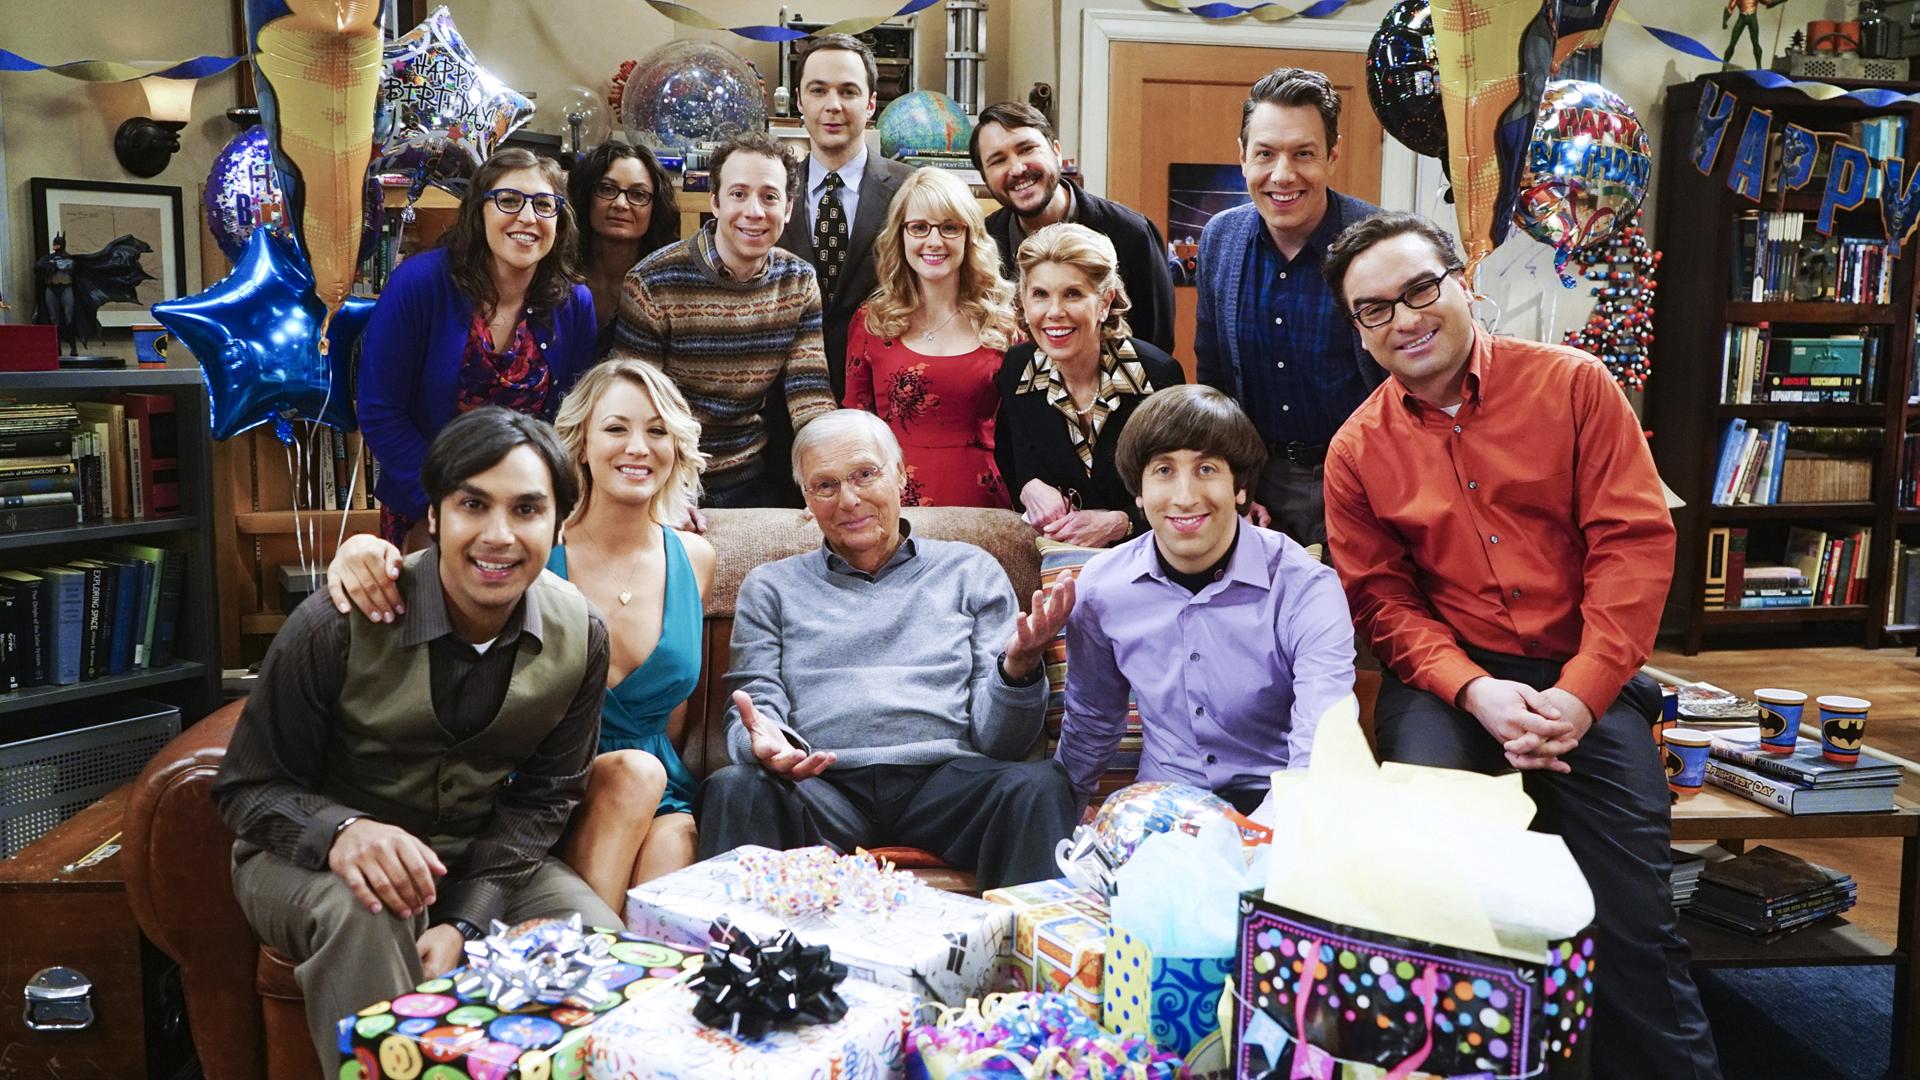 Adam West - The Big Bang Theory